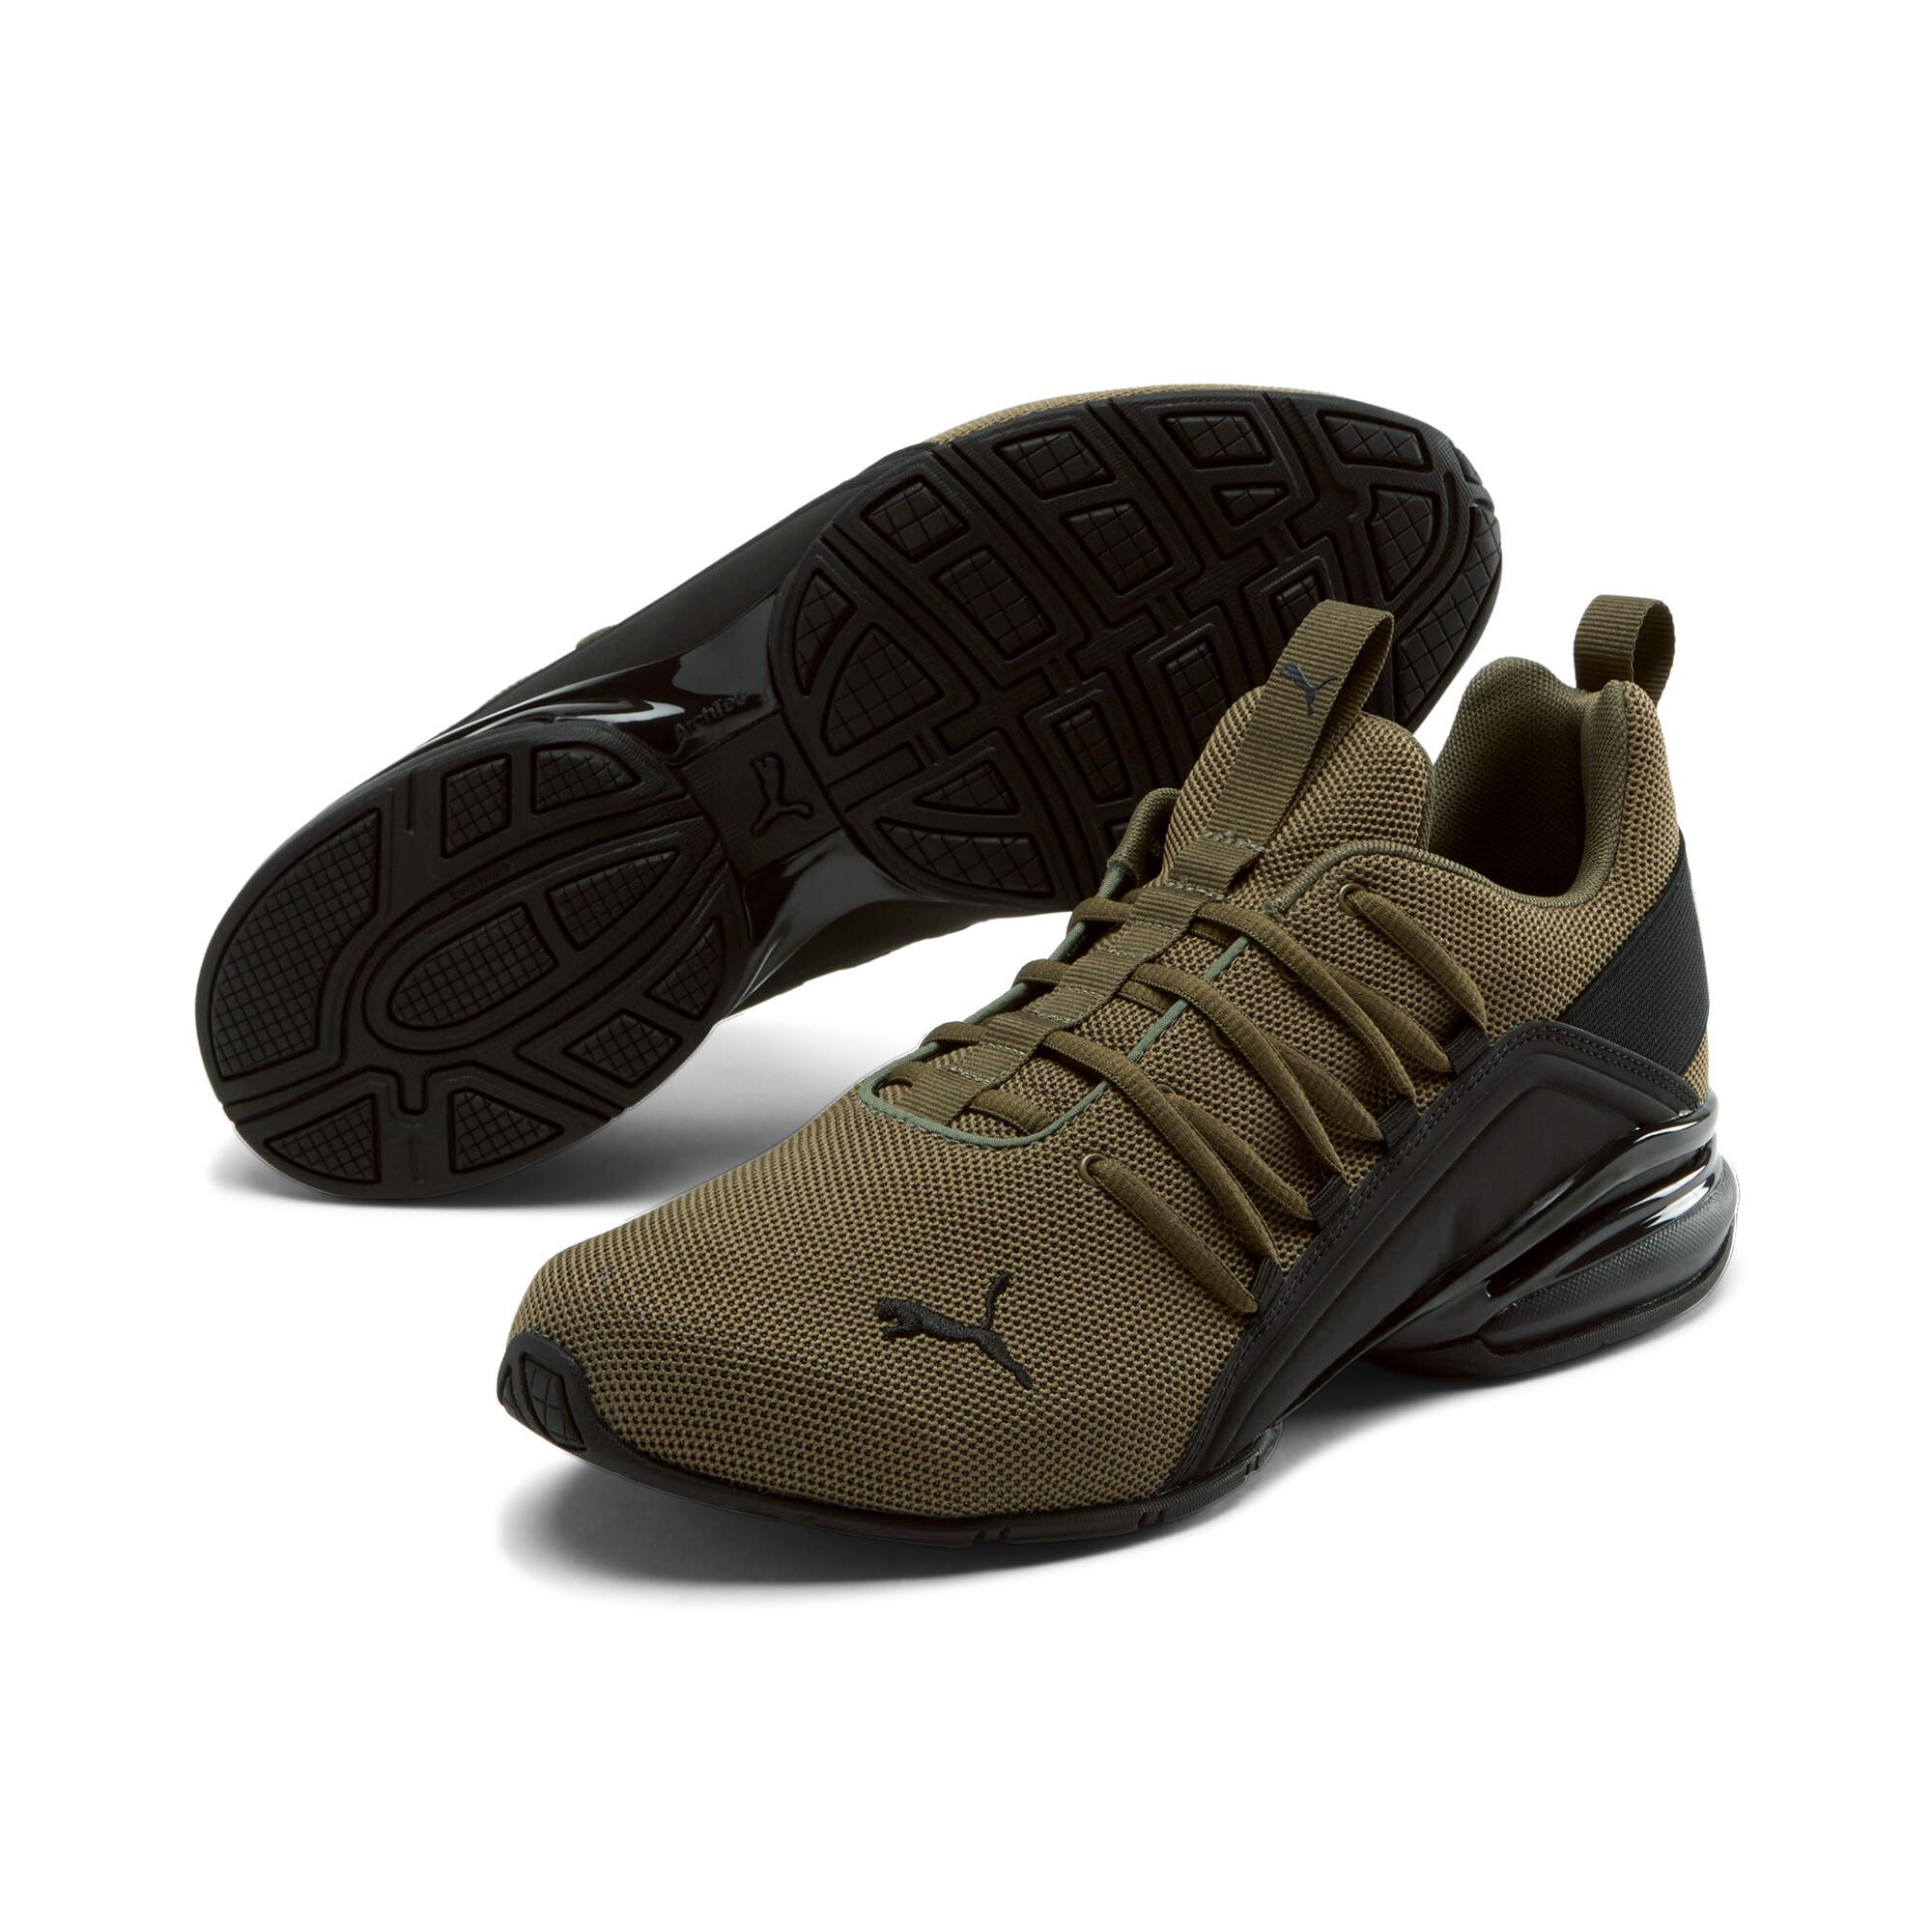 PUMA-Men-039-s-Momenta-Training-Shoes